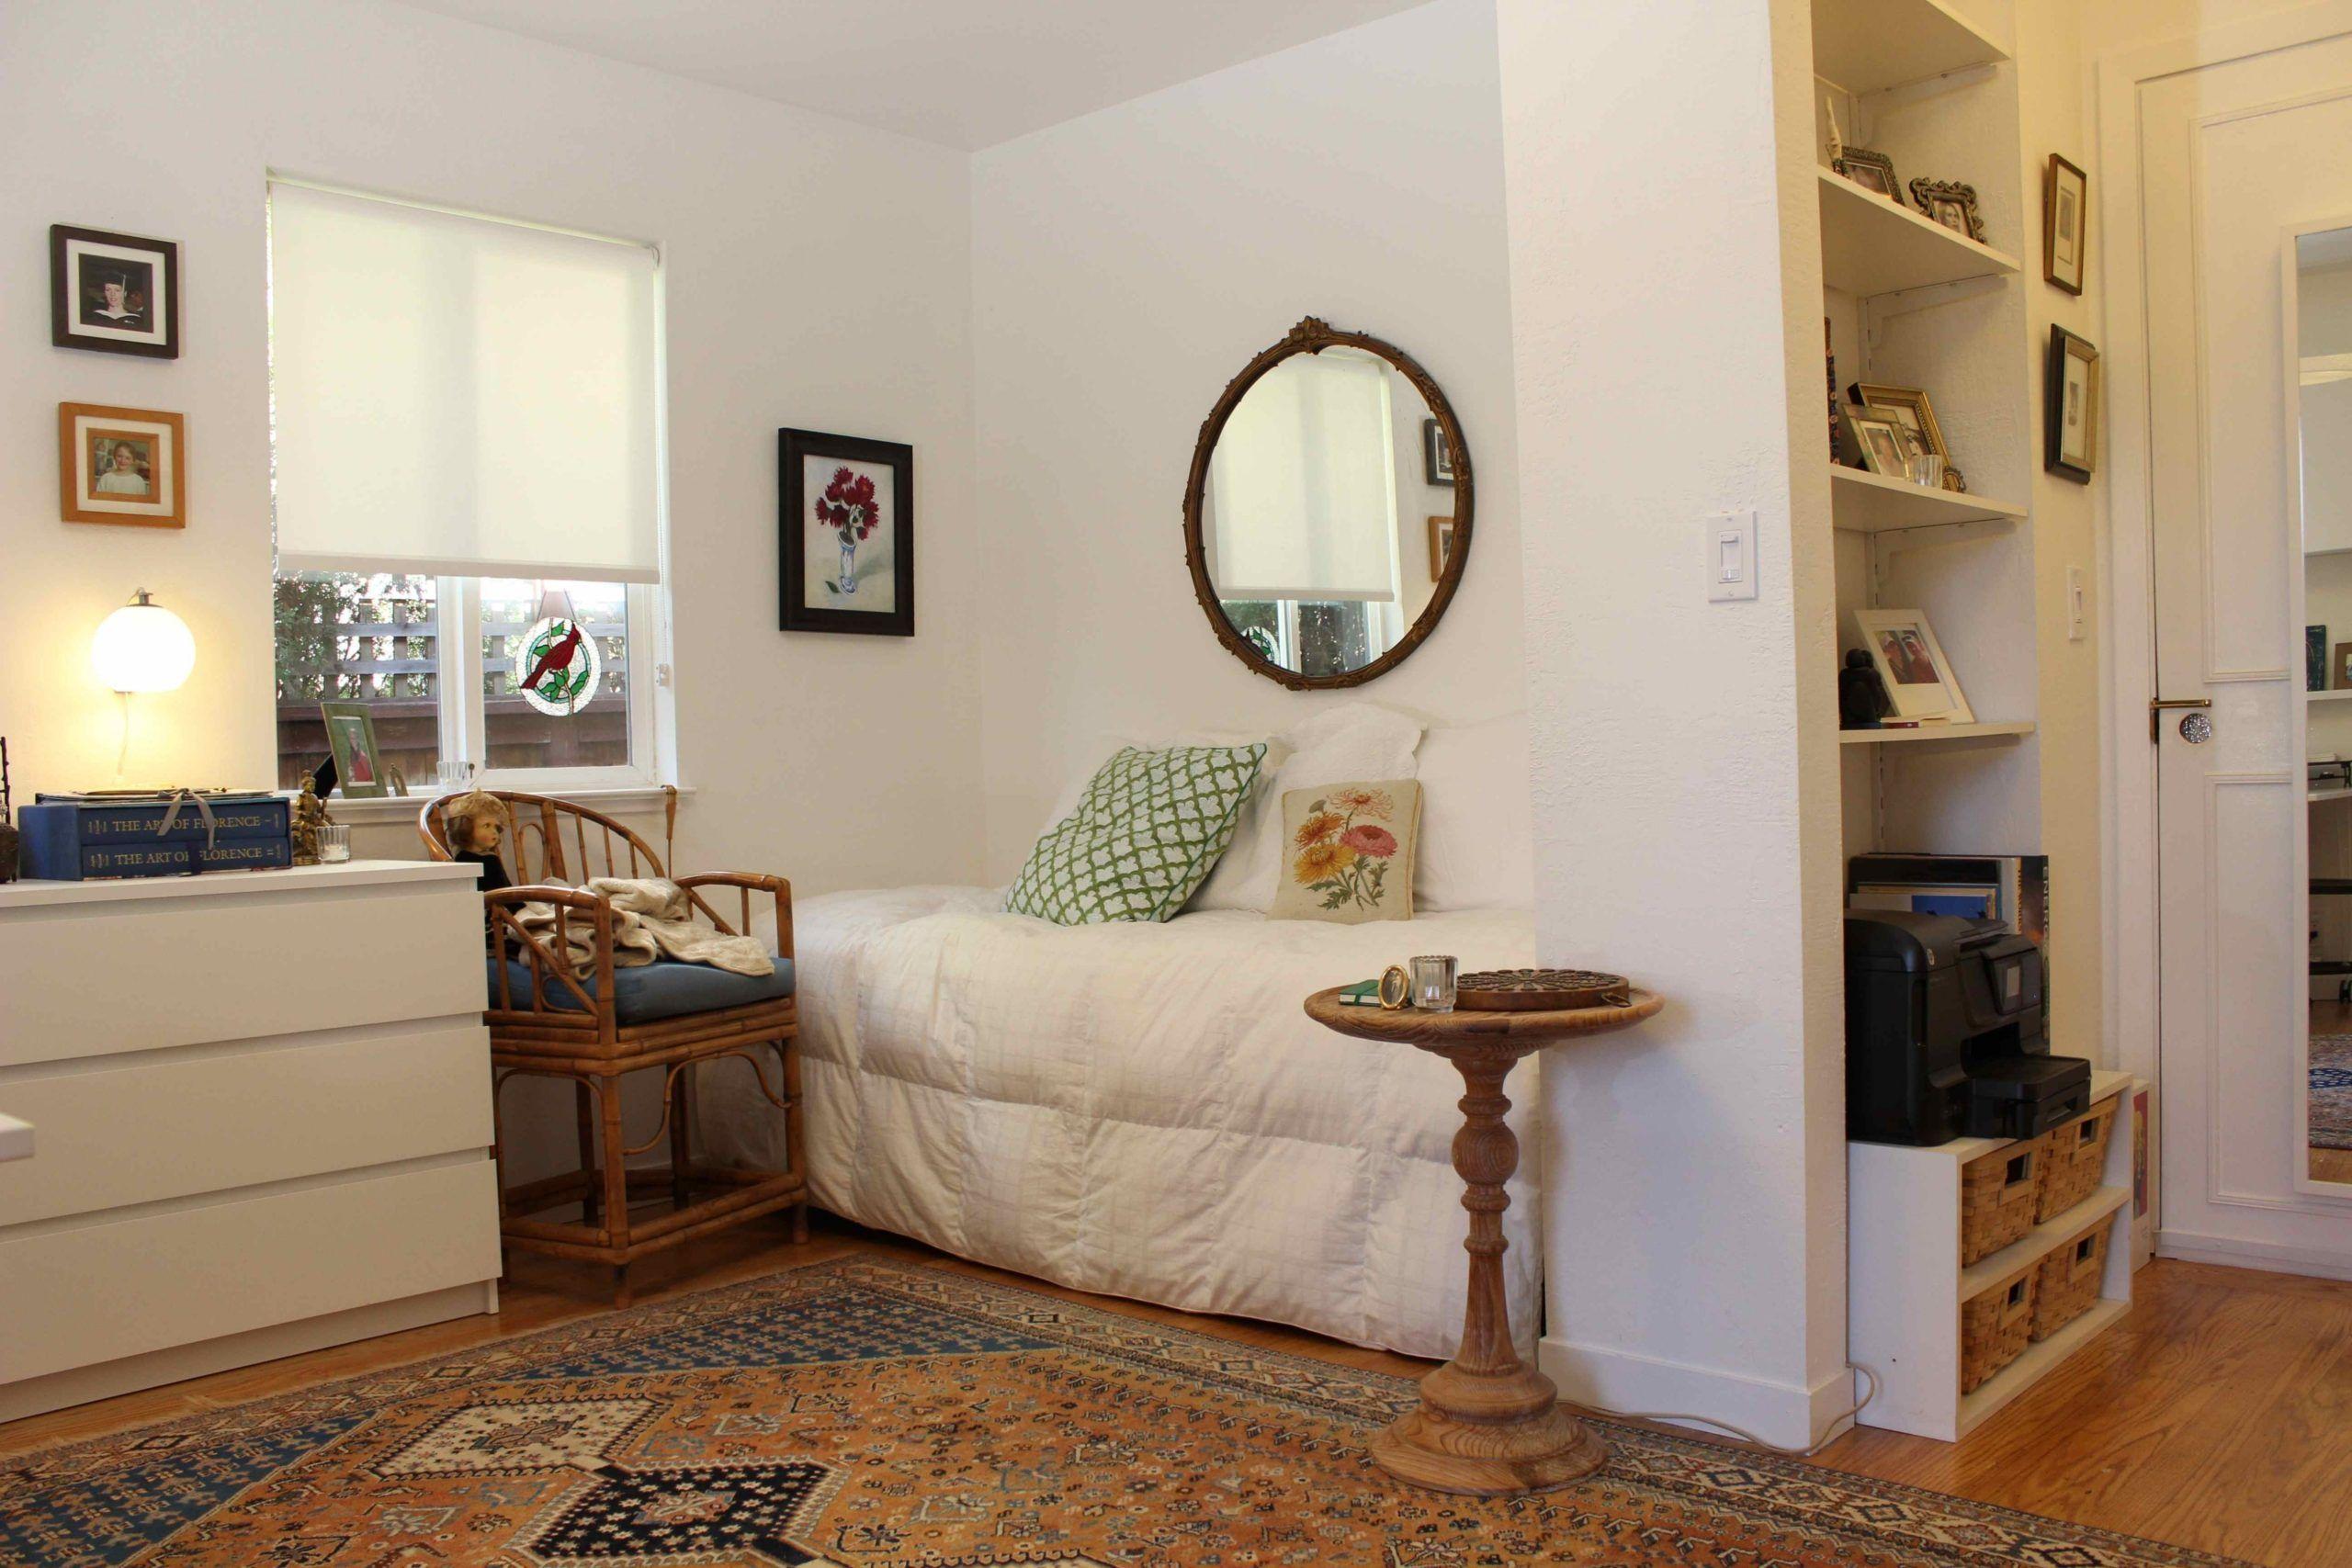 Junior One Bedroom Design Ideas in 7  Tiny house decor, Home